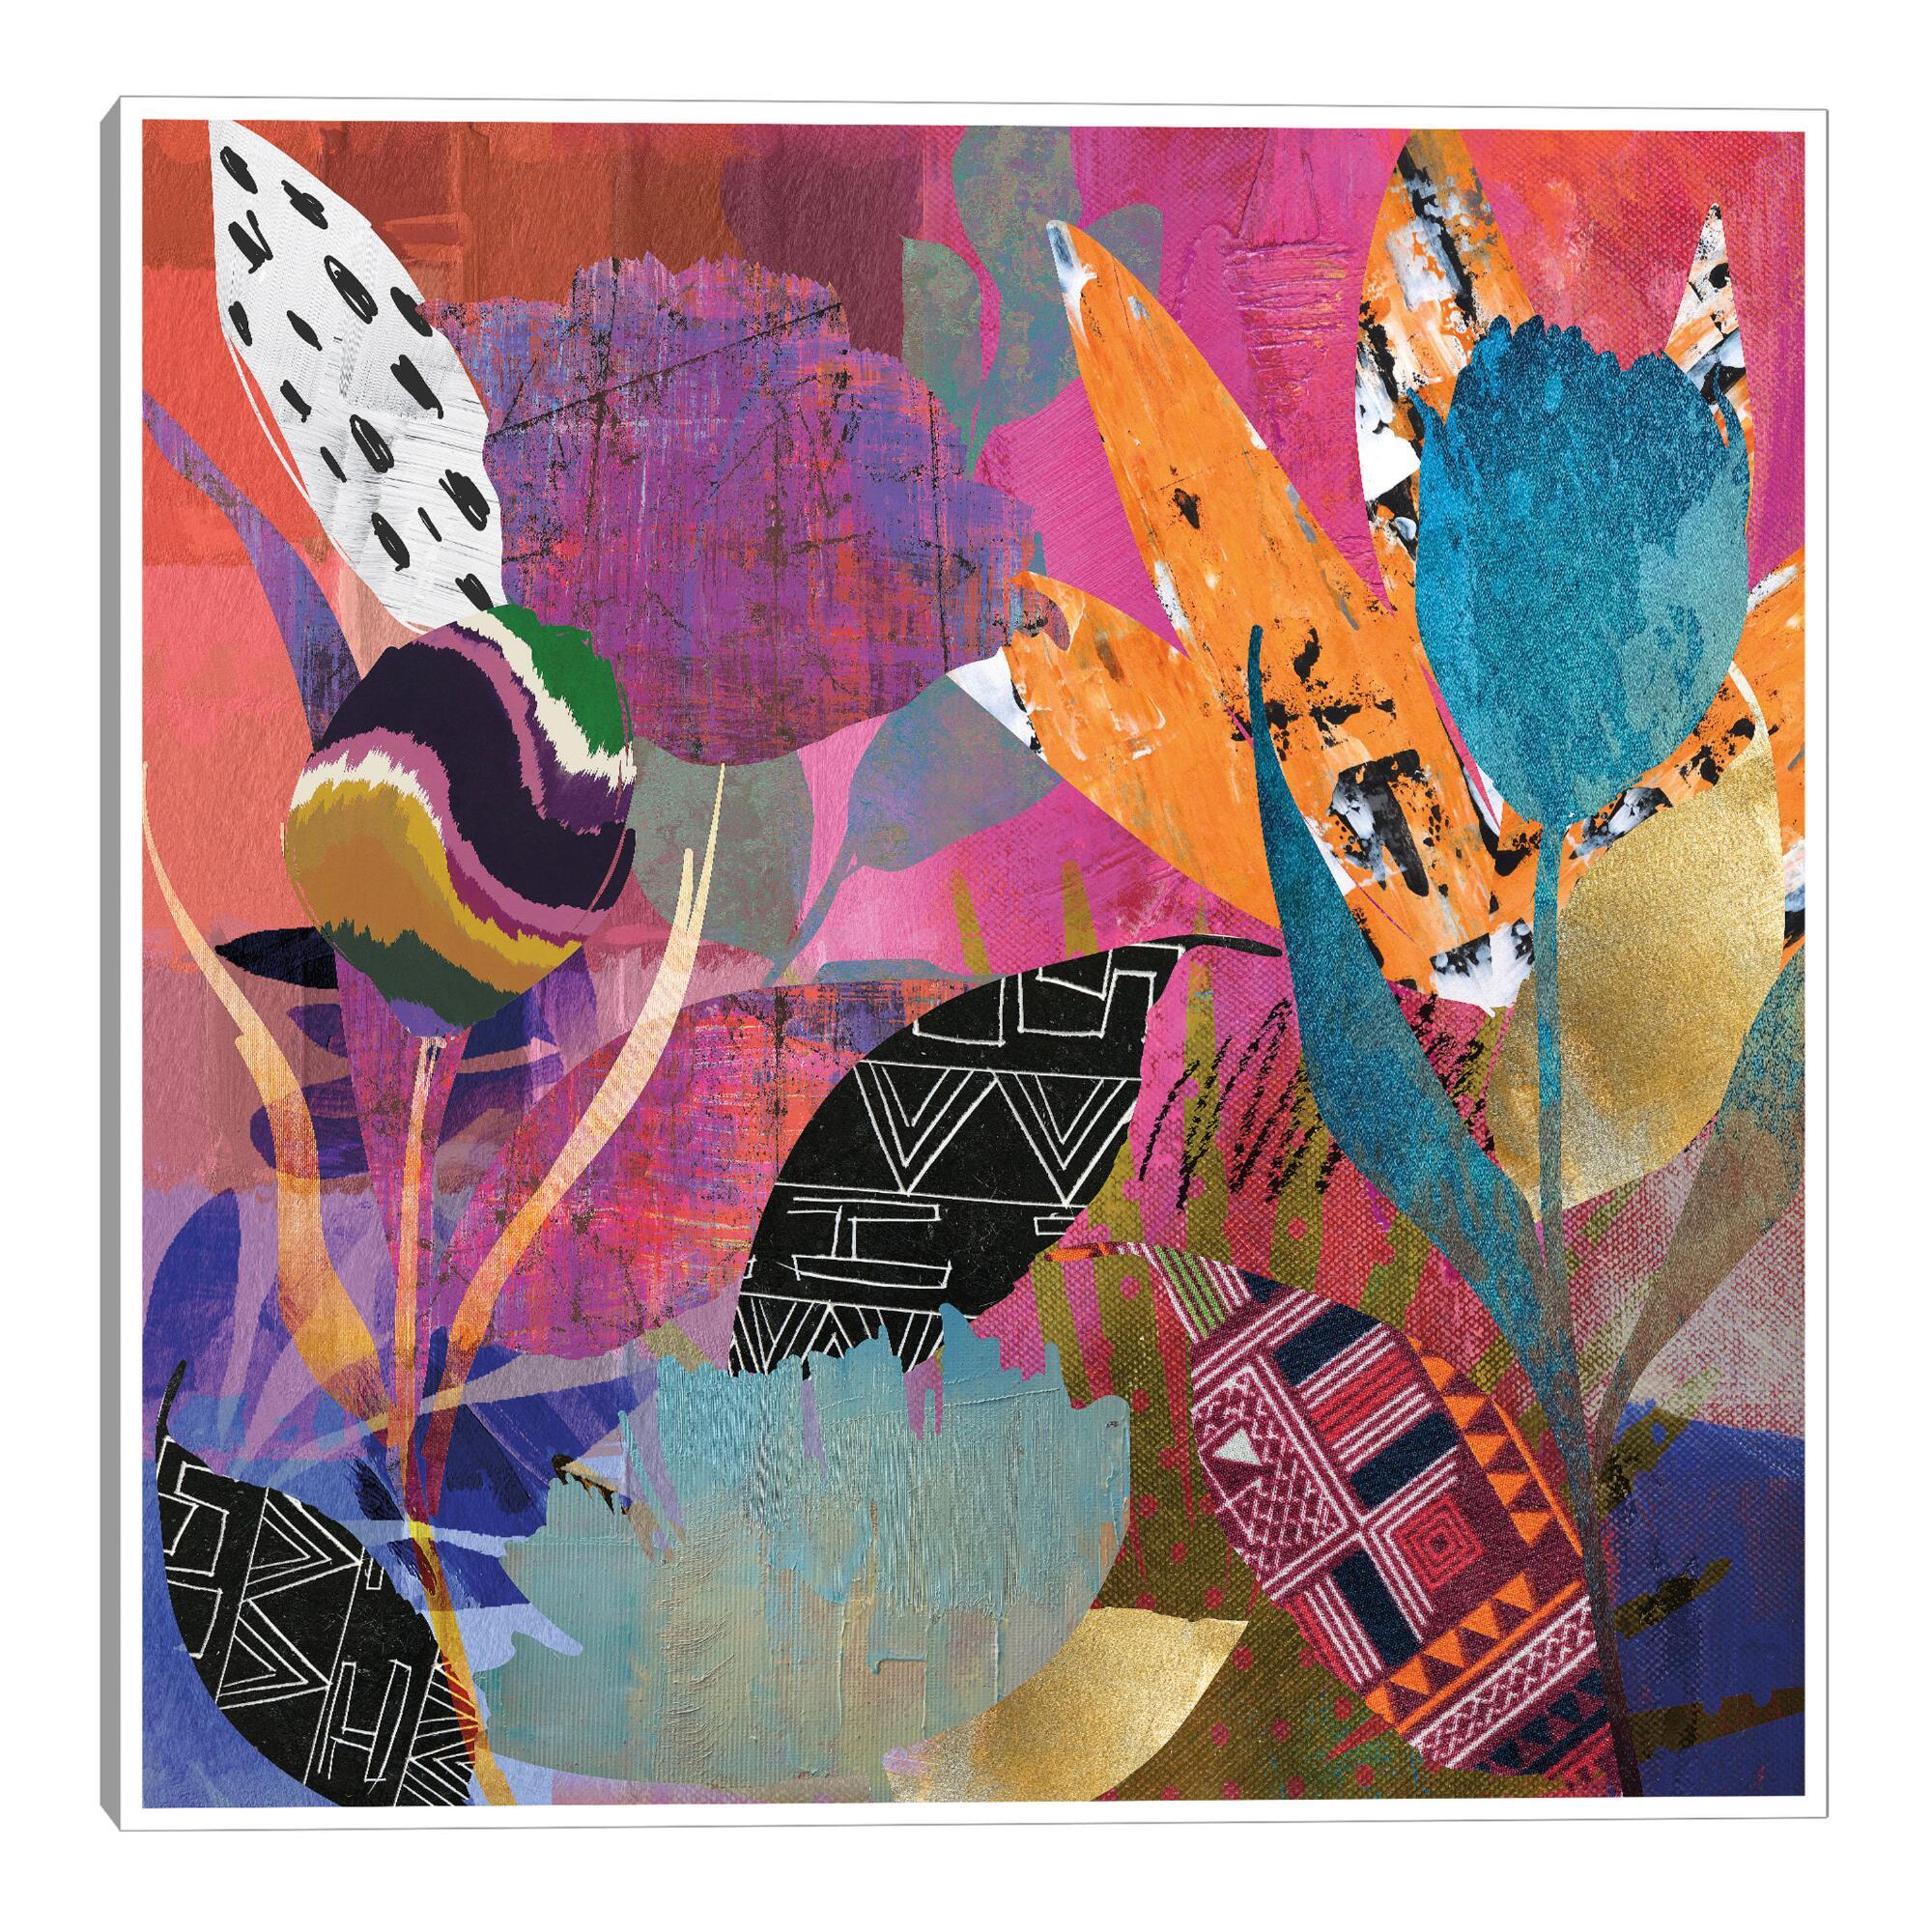 Flower Power By Nikki Chu Framed Canvas Wall Art $119.99